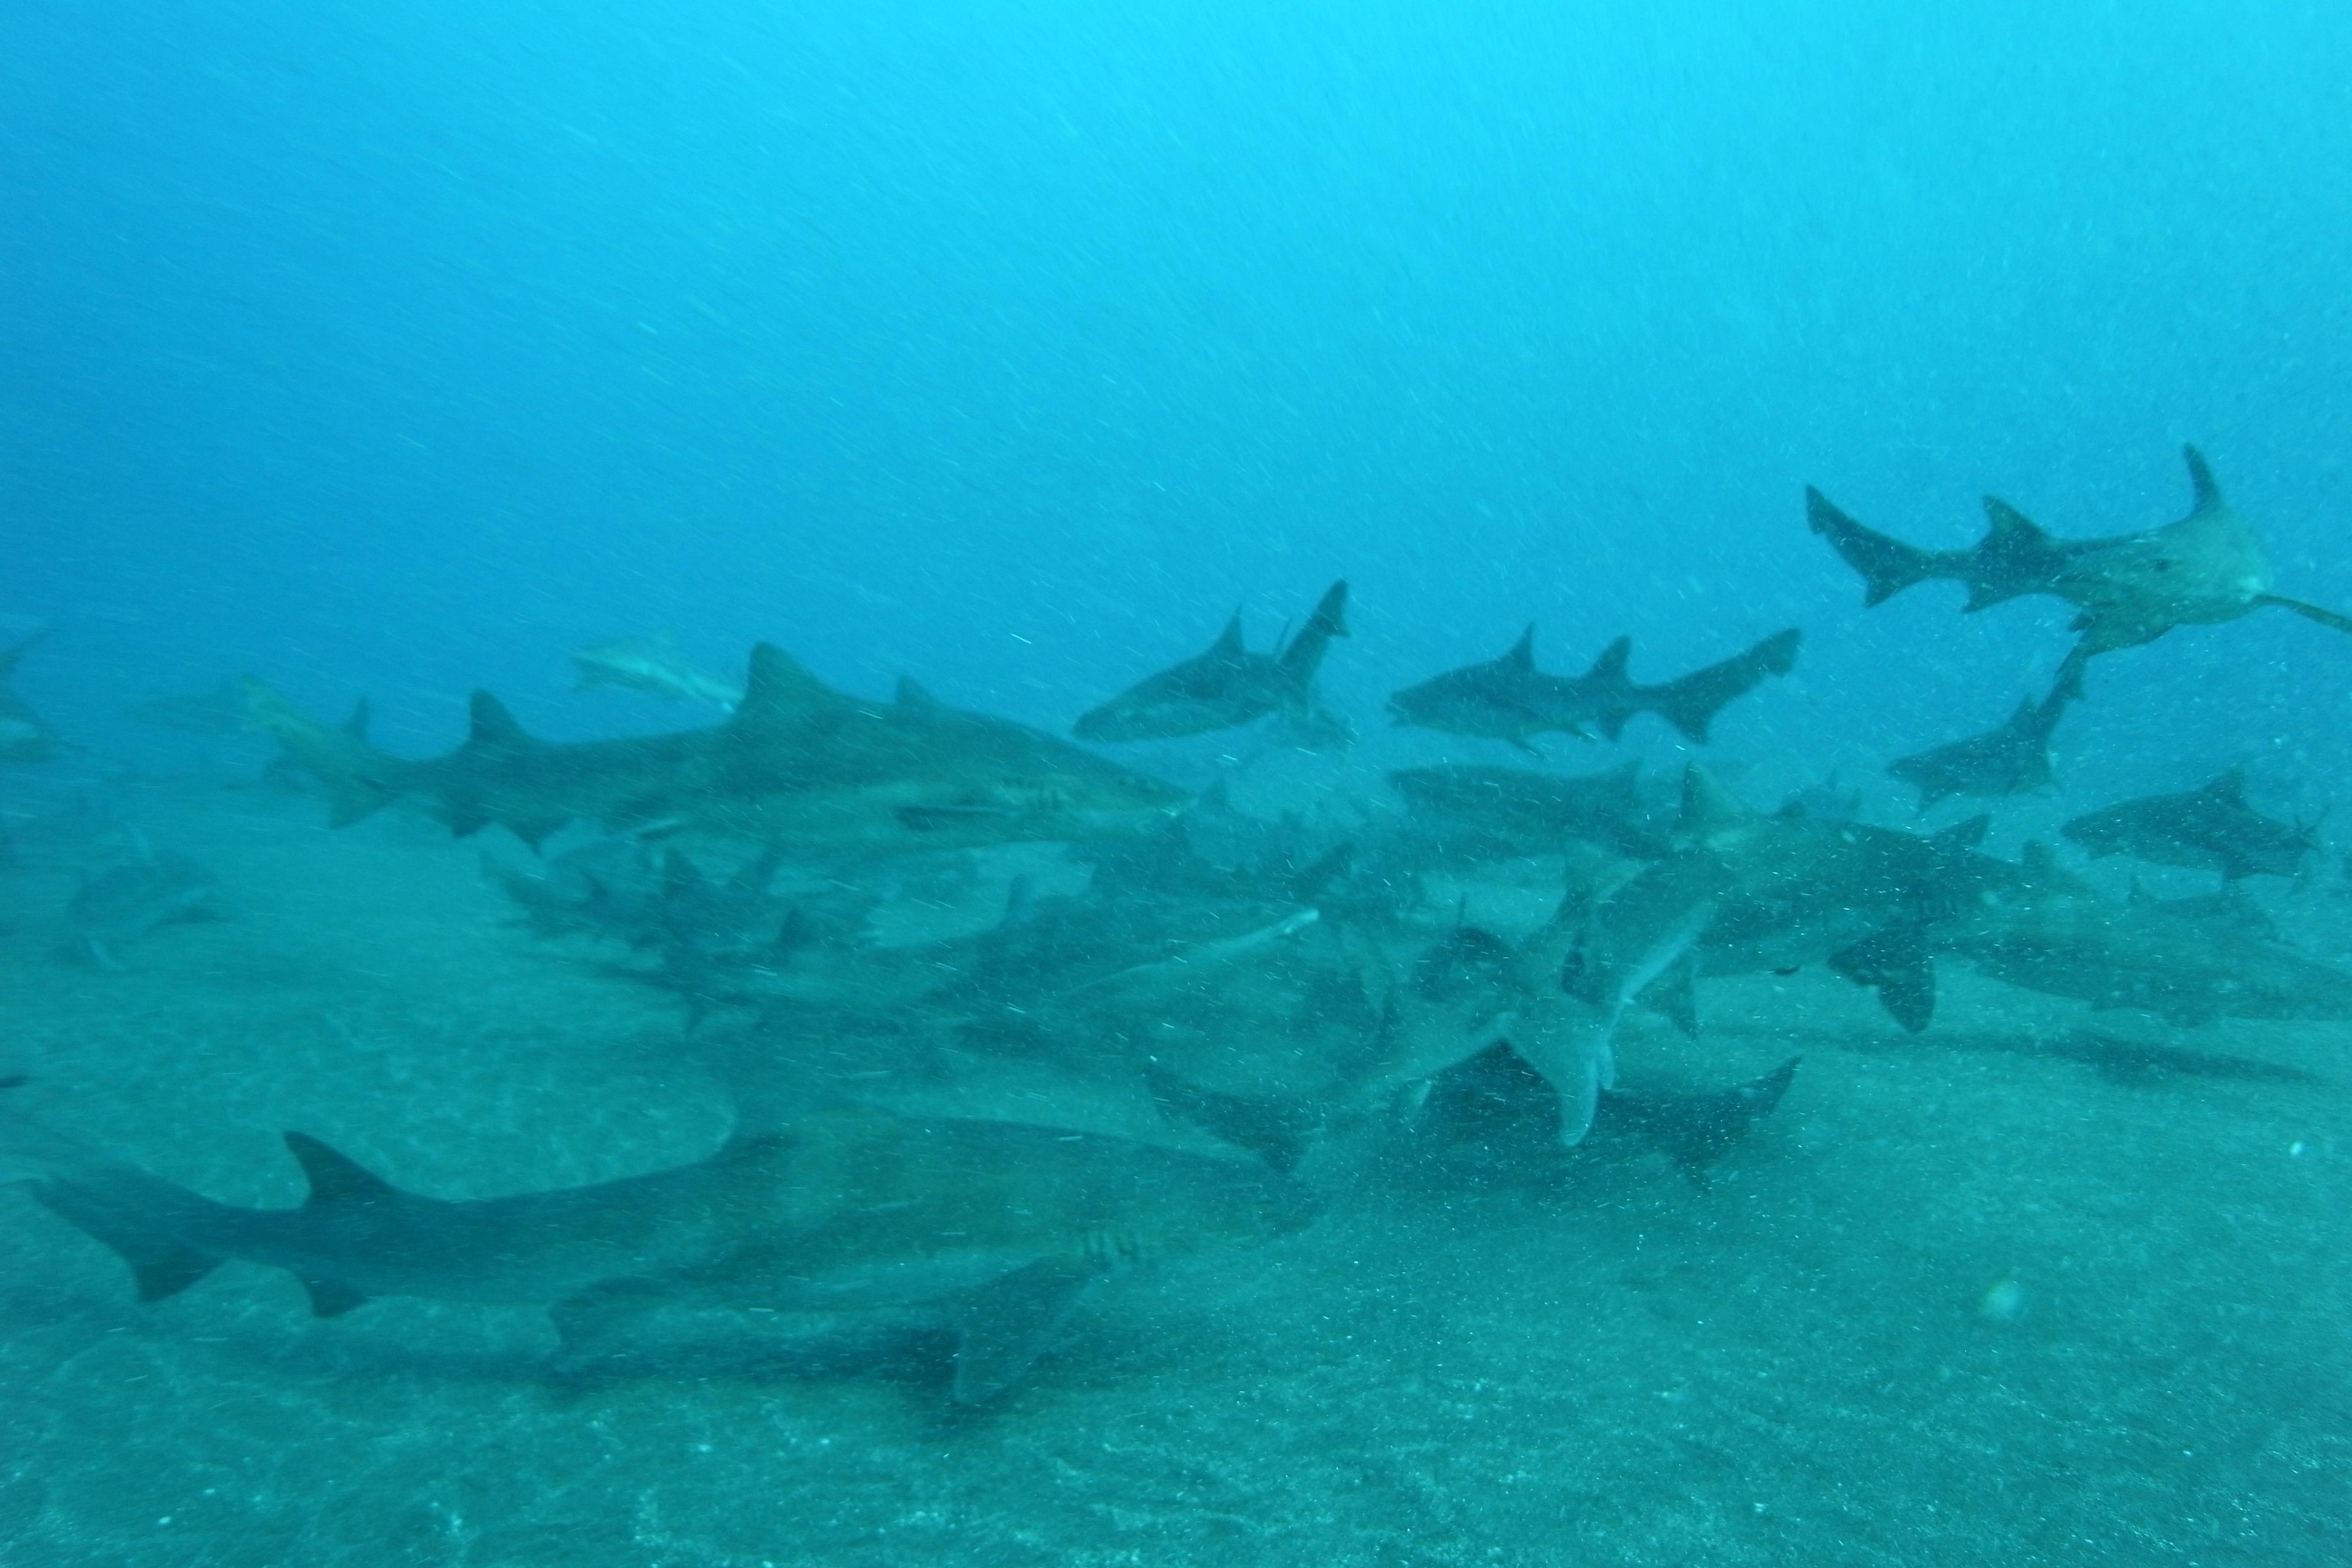 Shark-rayM0014756